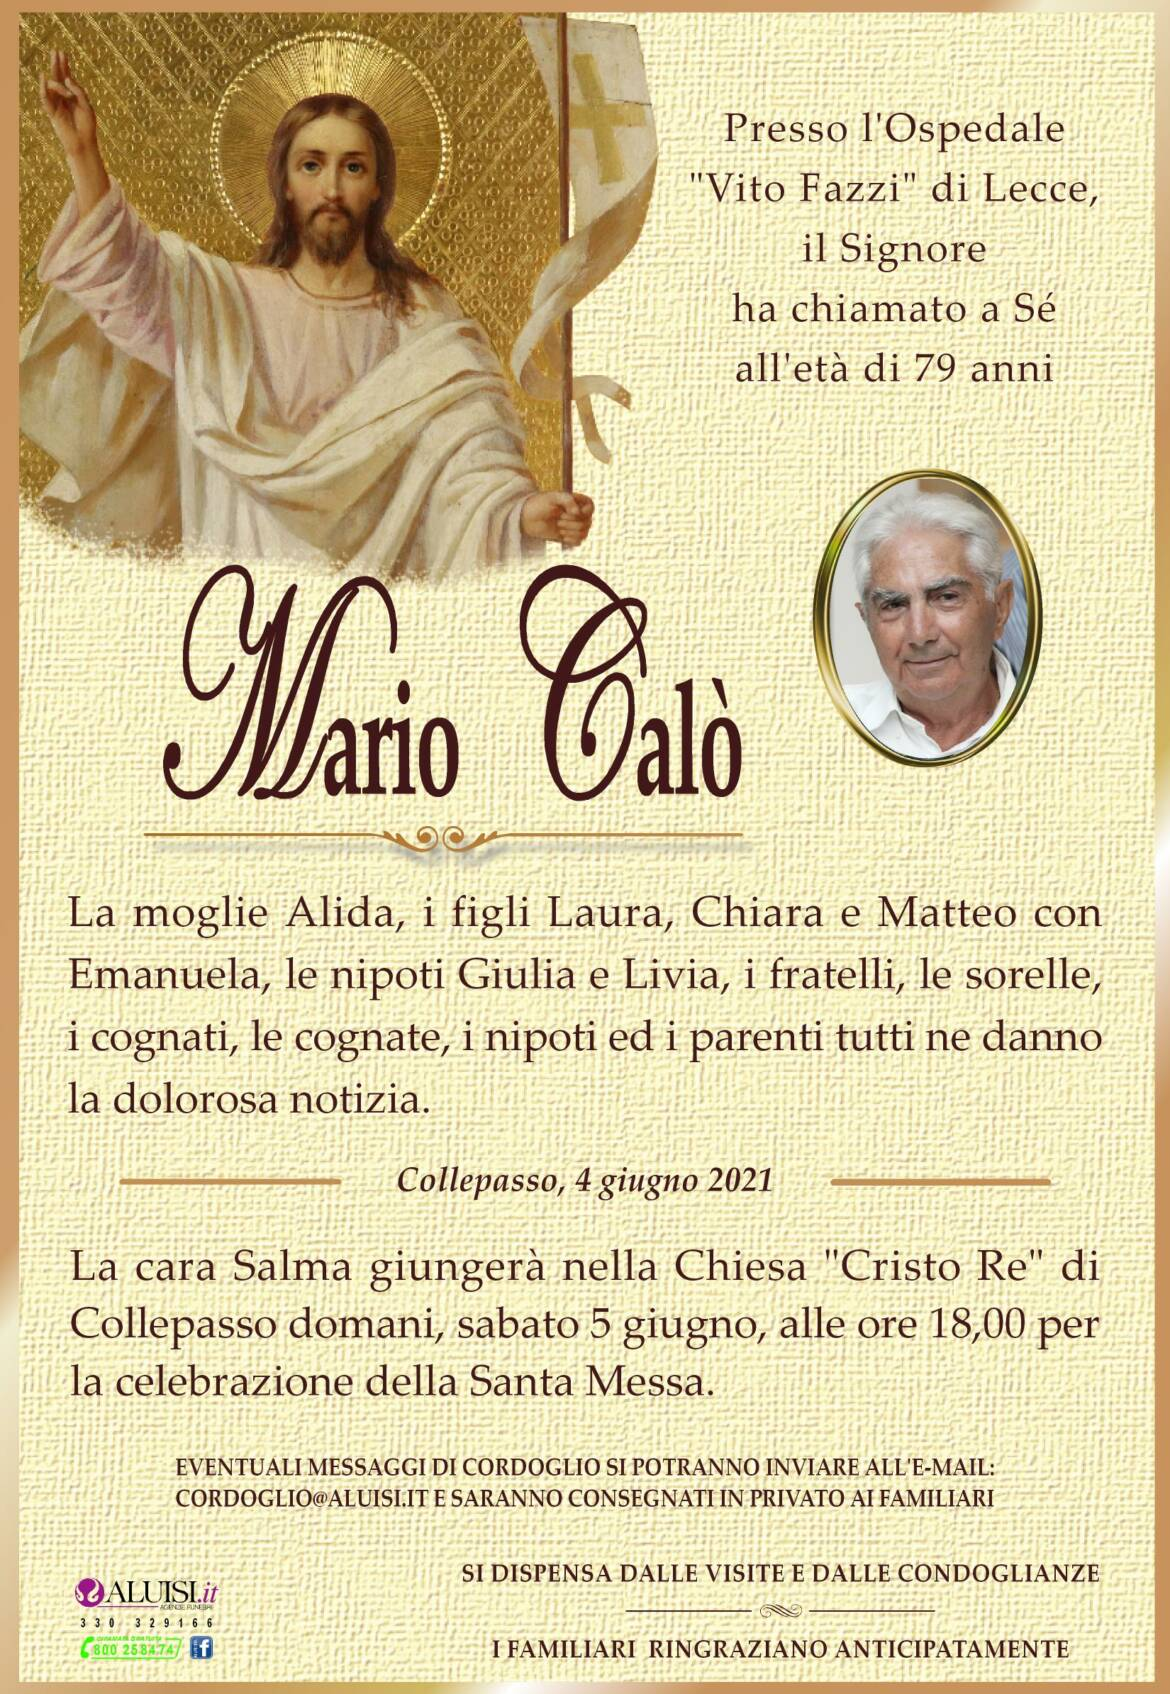 Annuncio-MARIO-CALo-COLLEPASSO-1.jpg